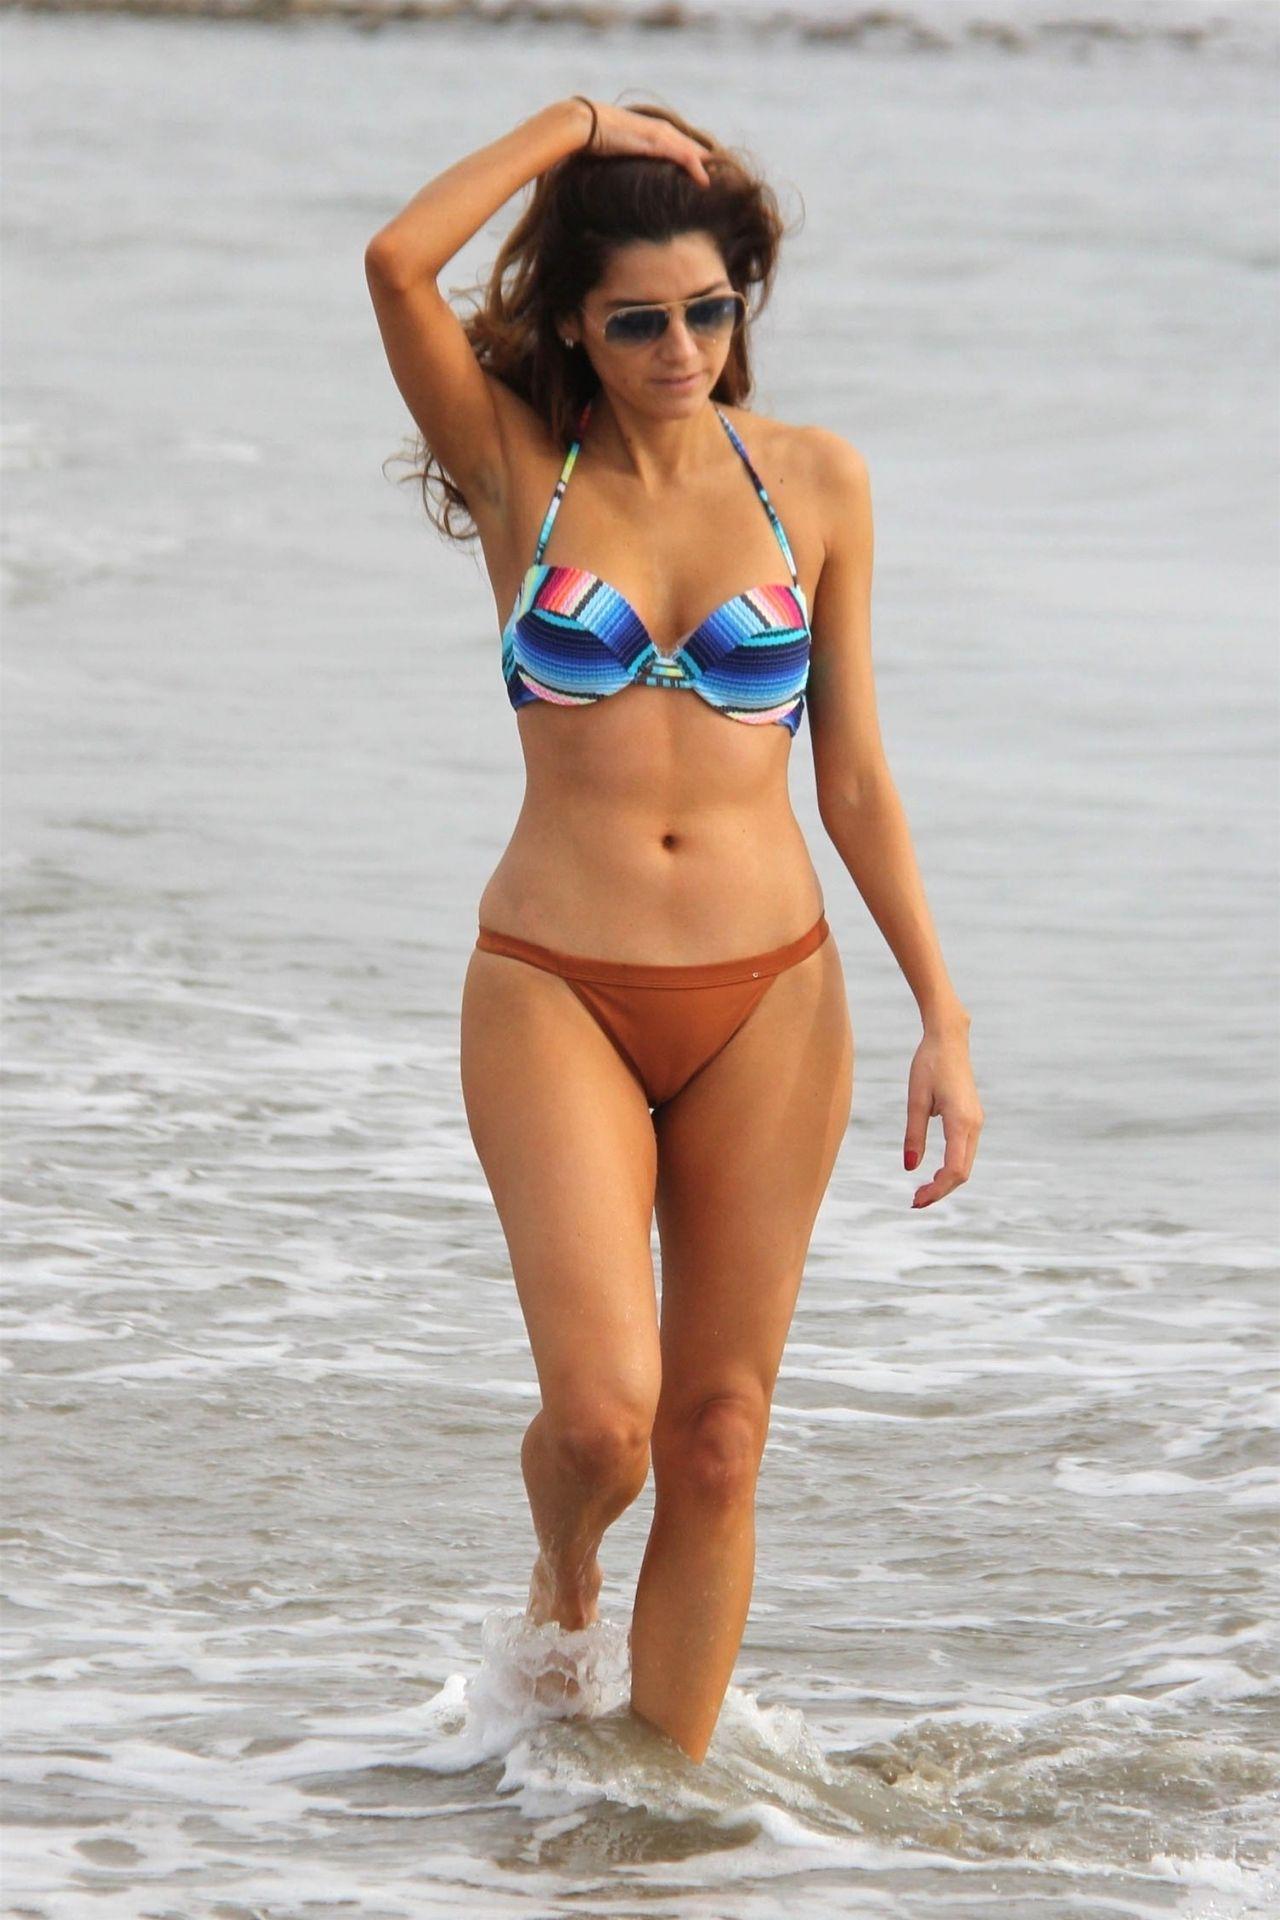 Bikini Blanca Blanco nudes (17 photos), Sexy, Paparazzi, Twitter, butt 2015